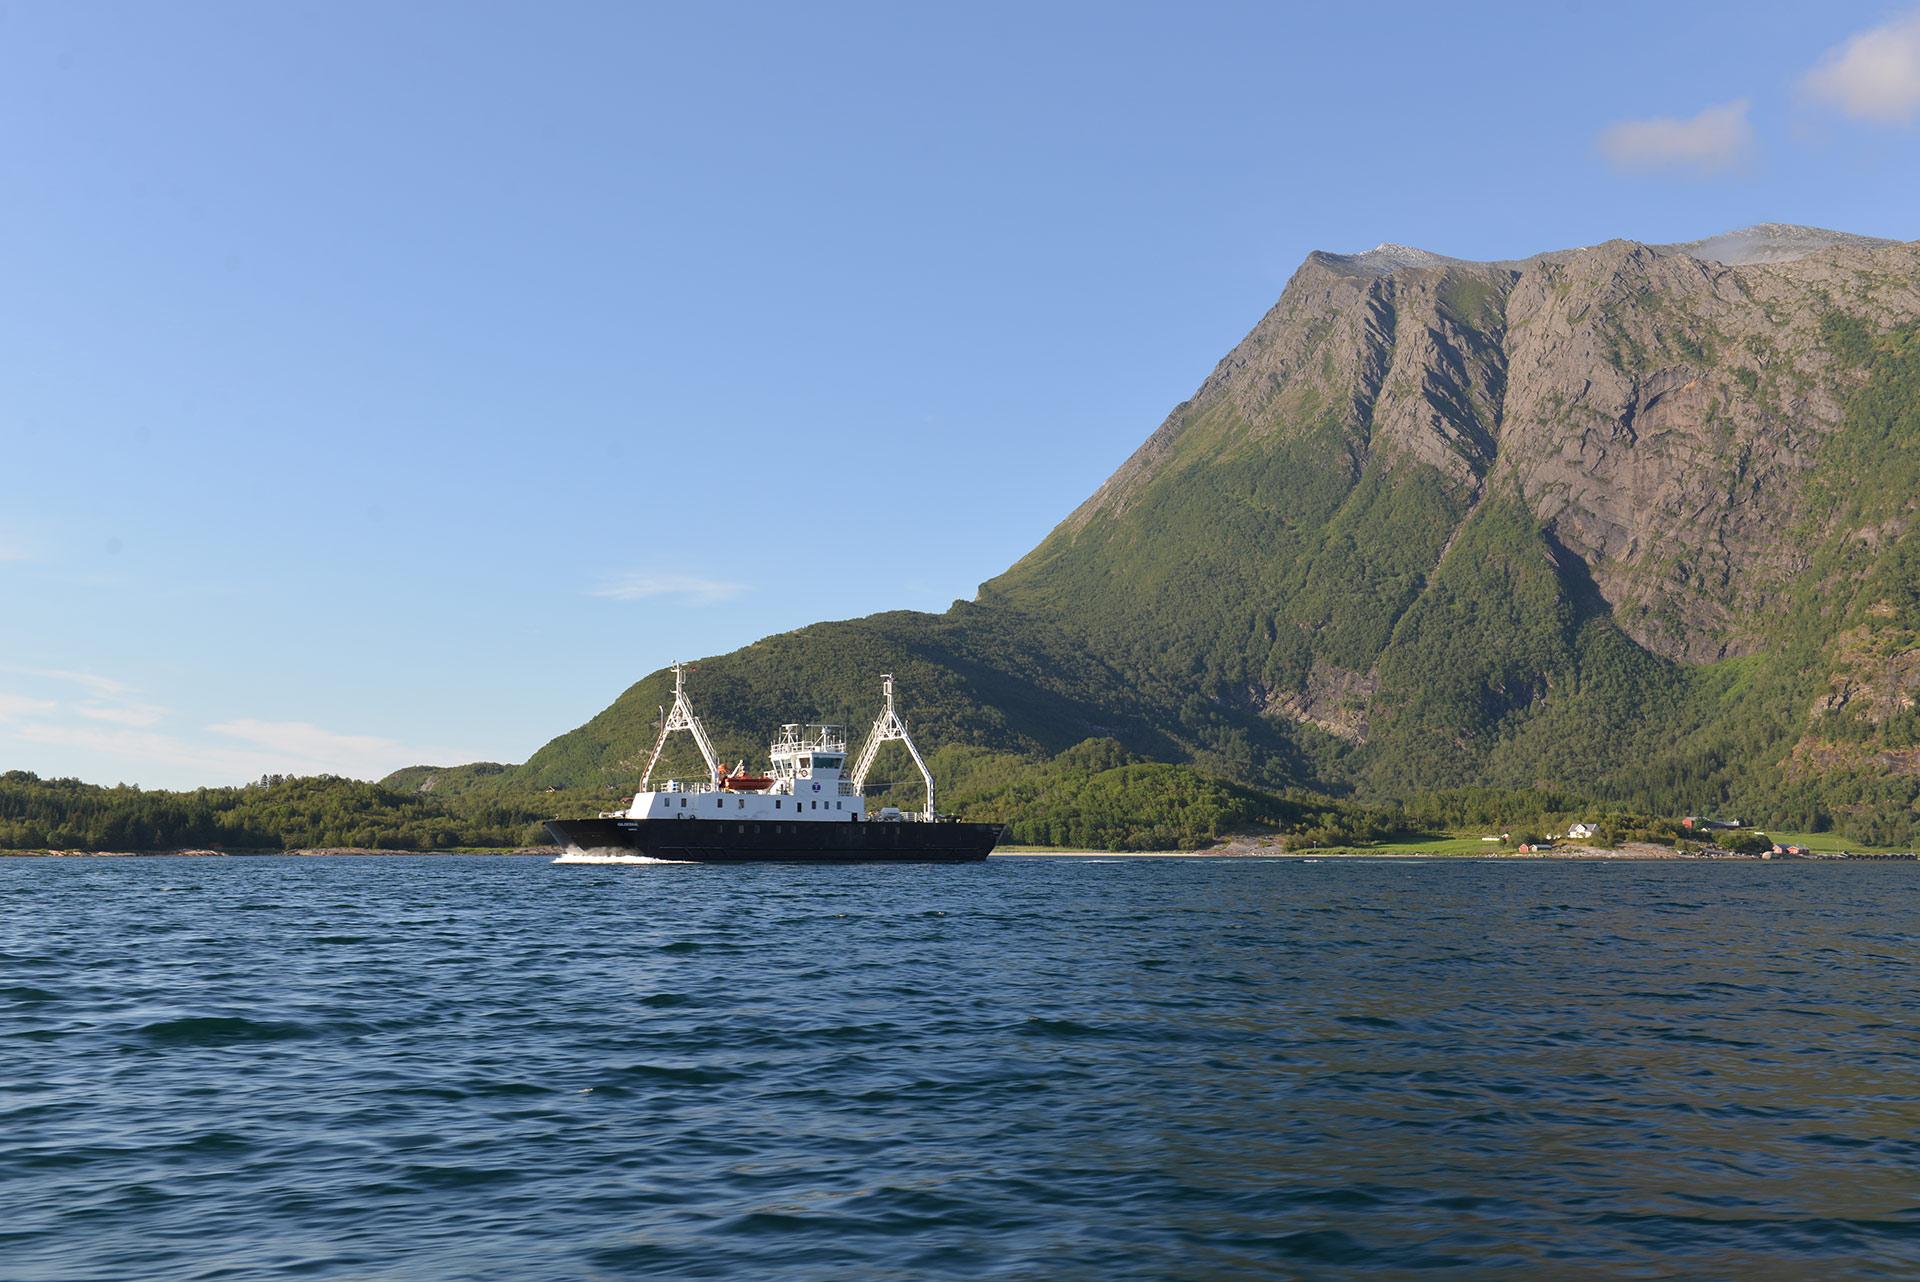 Svært få turister reiser med fergene rundt i Gildeskål, og det er synd © Brynjar Hilling